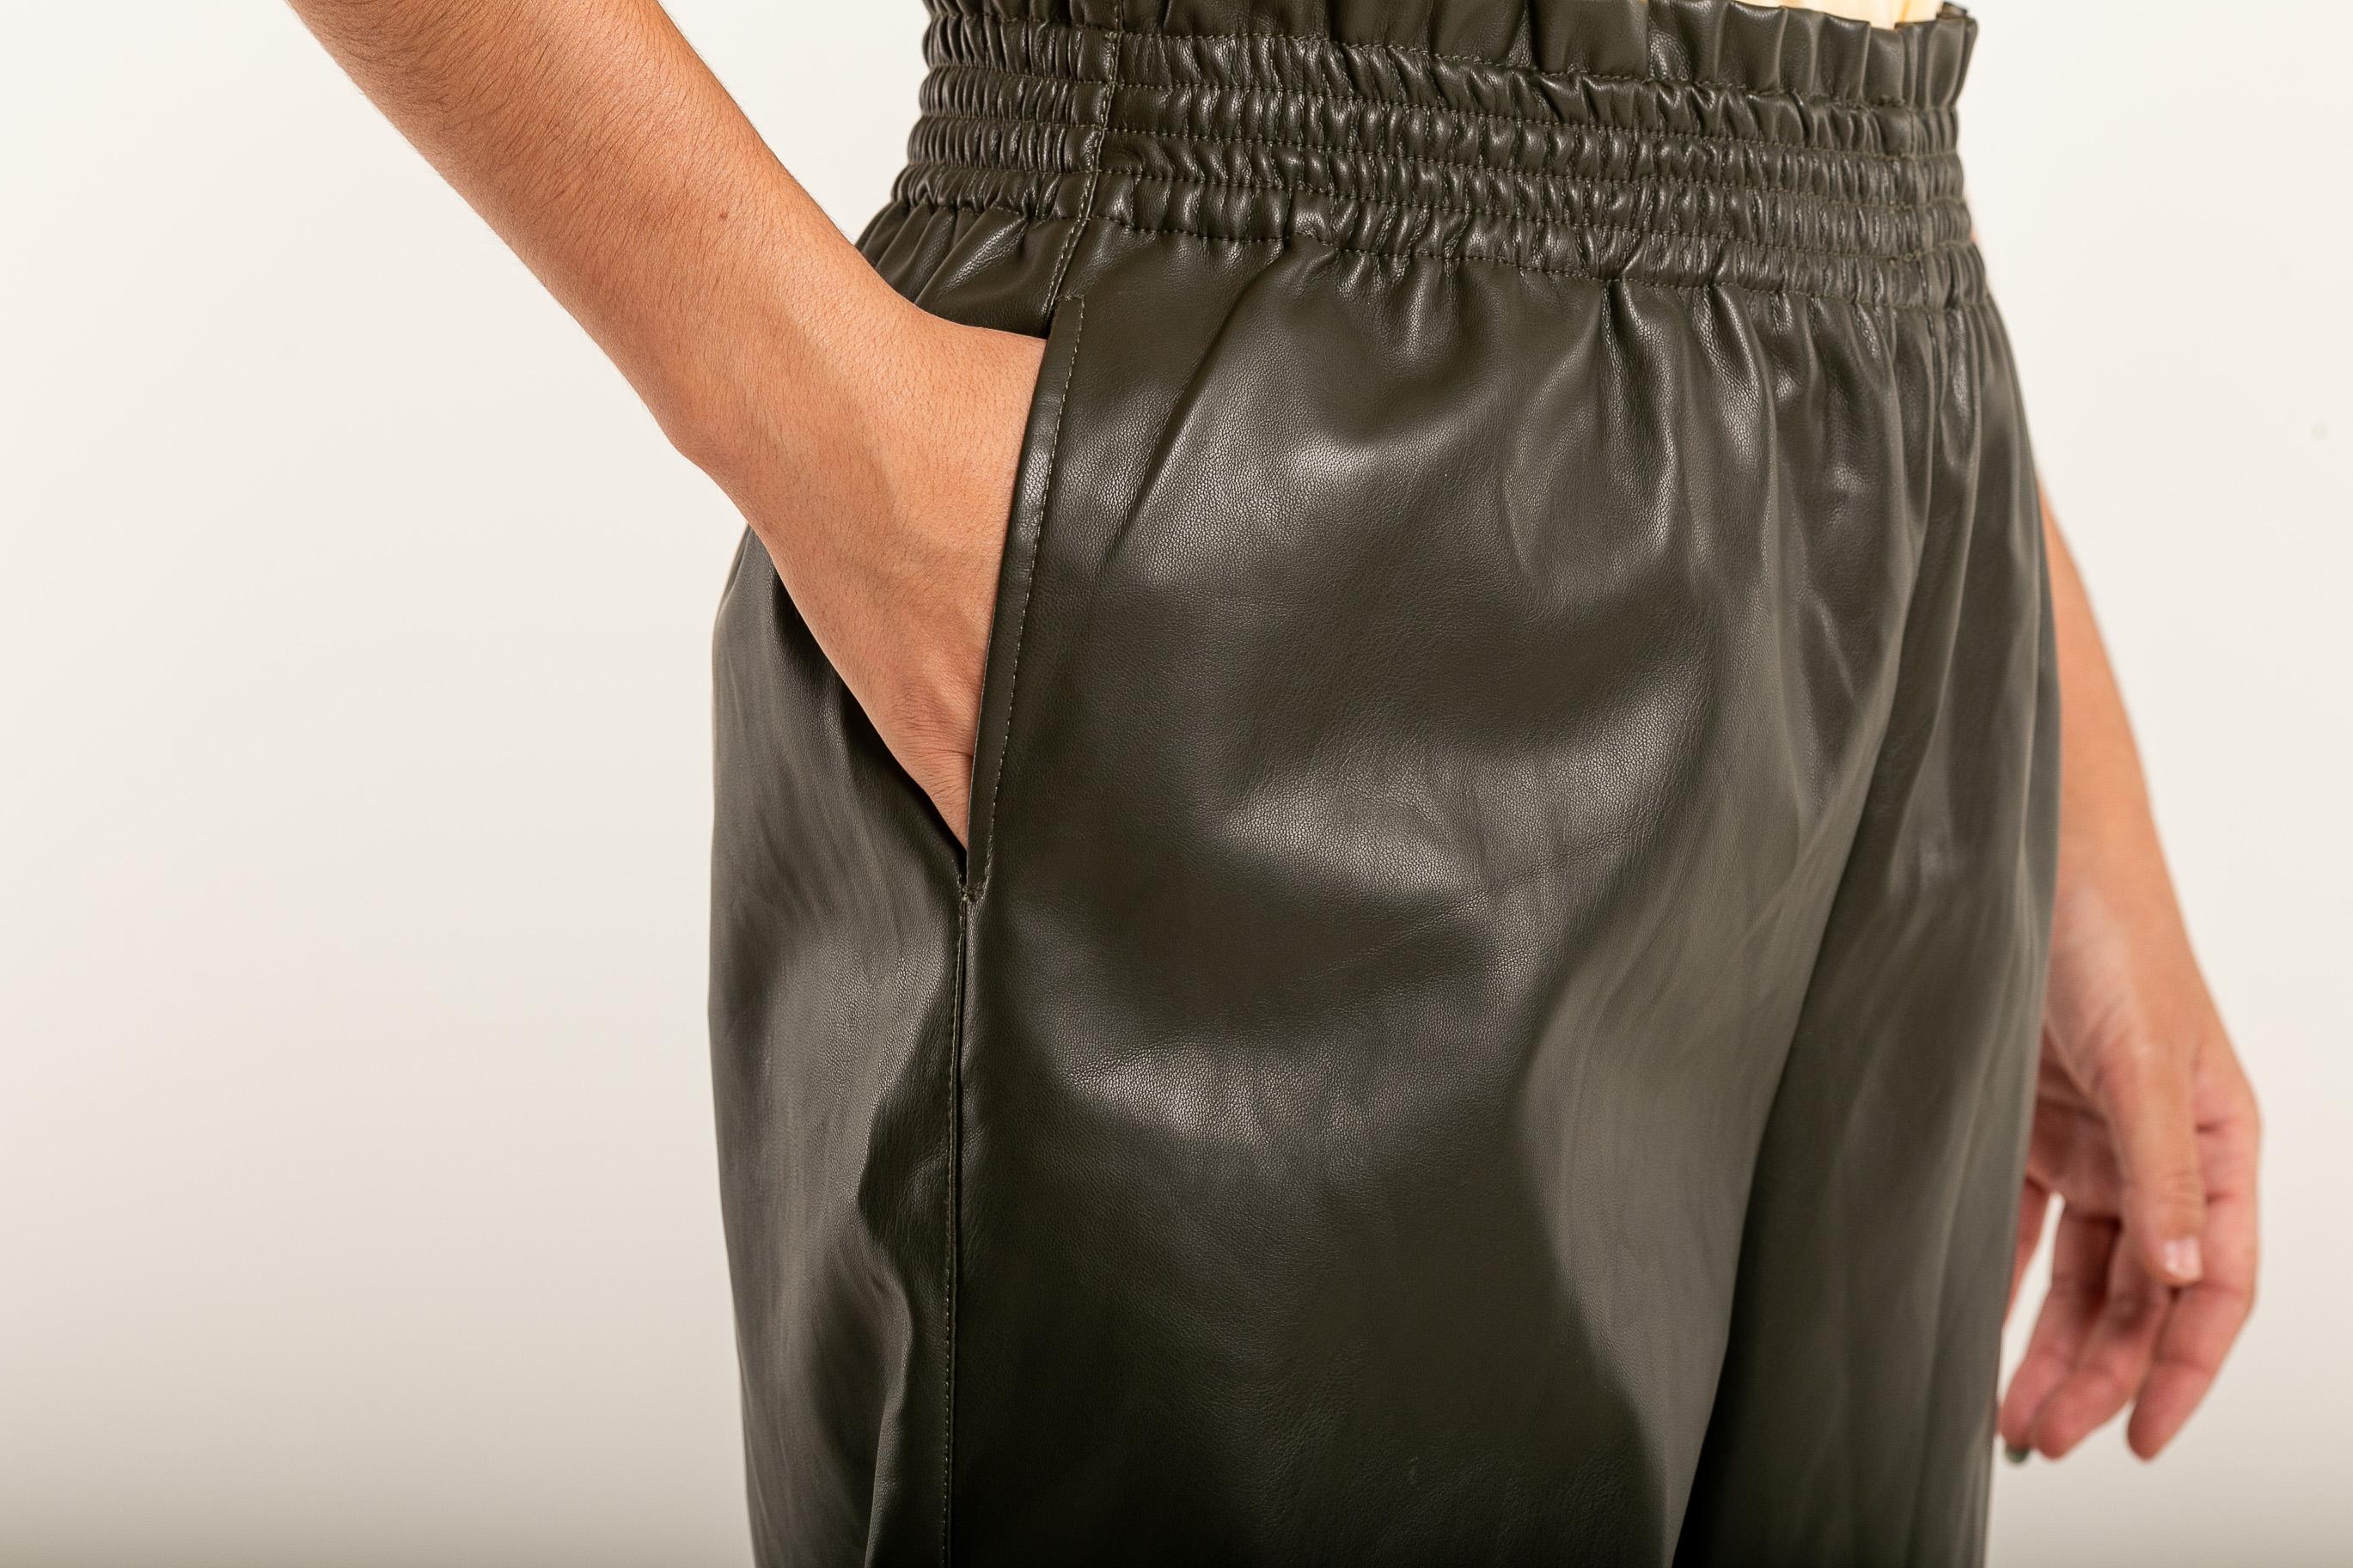 Pantaloni ONLY Casual (3334) photo 2